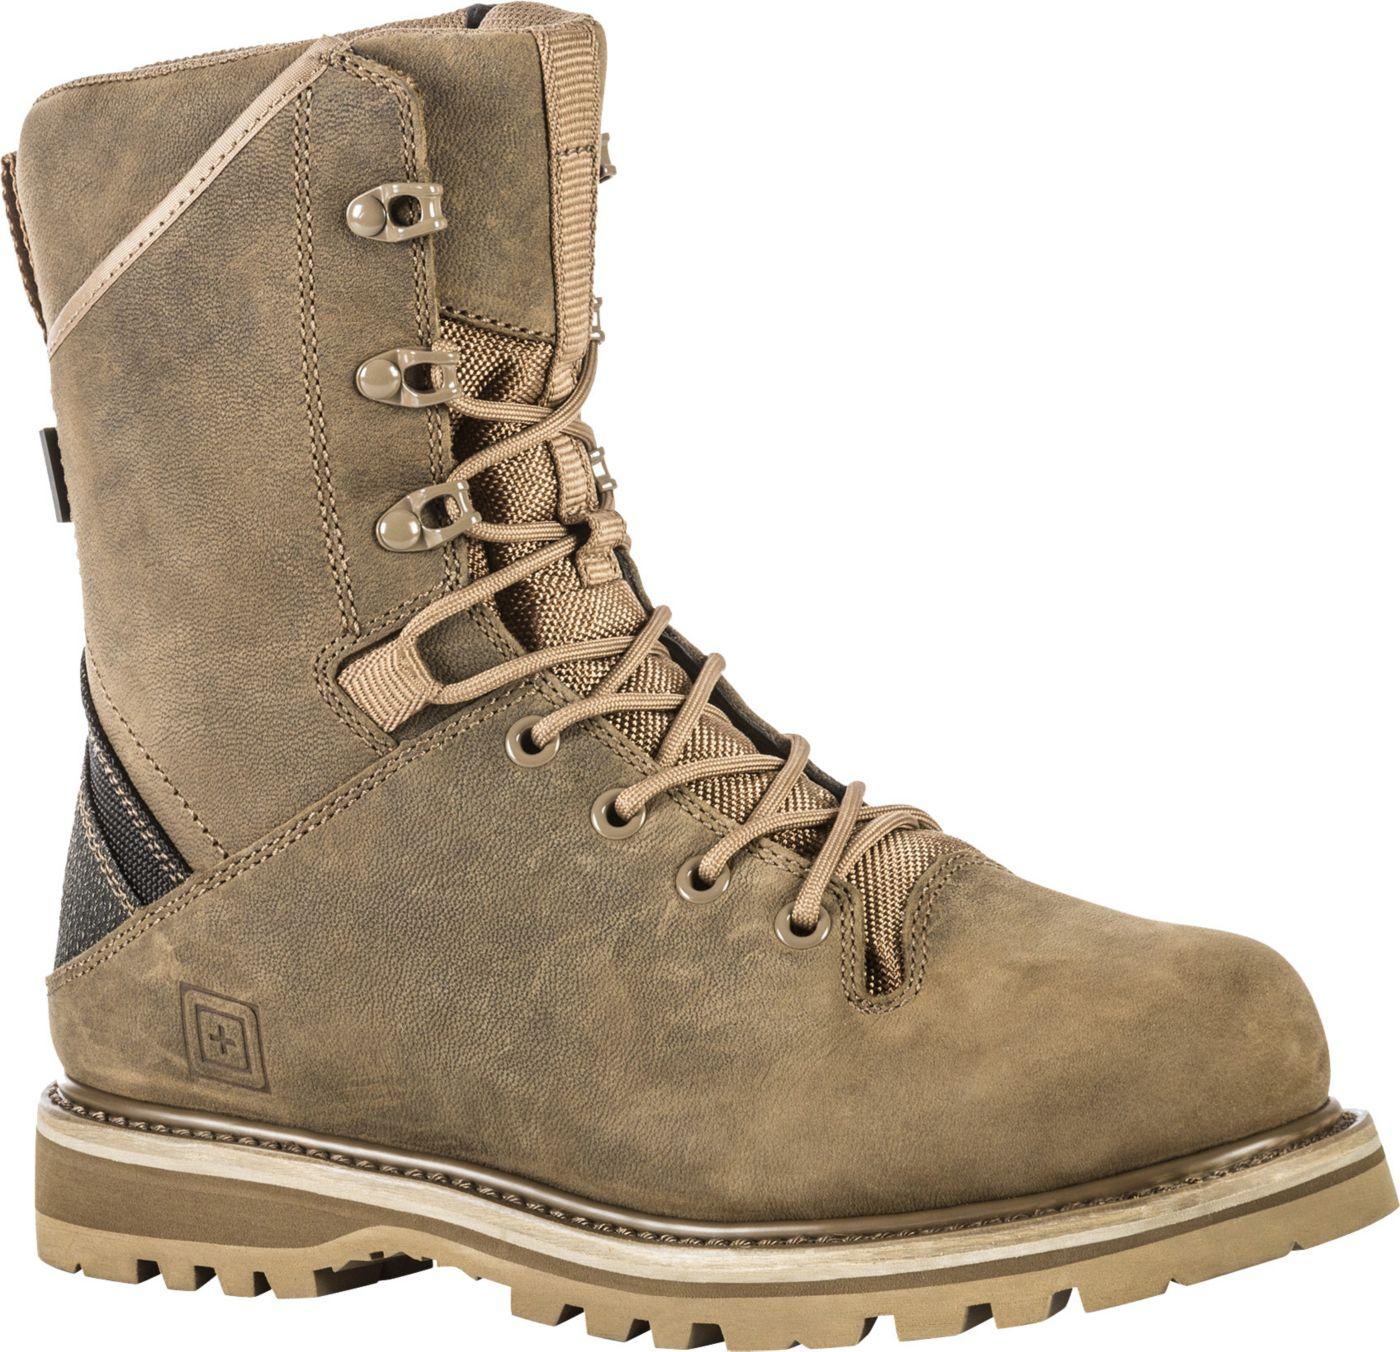 5.11 Tactical Men's Apex 8'' Waterproof Tactical Boots